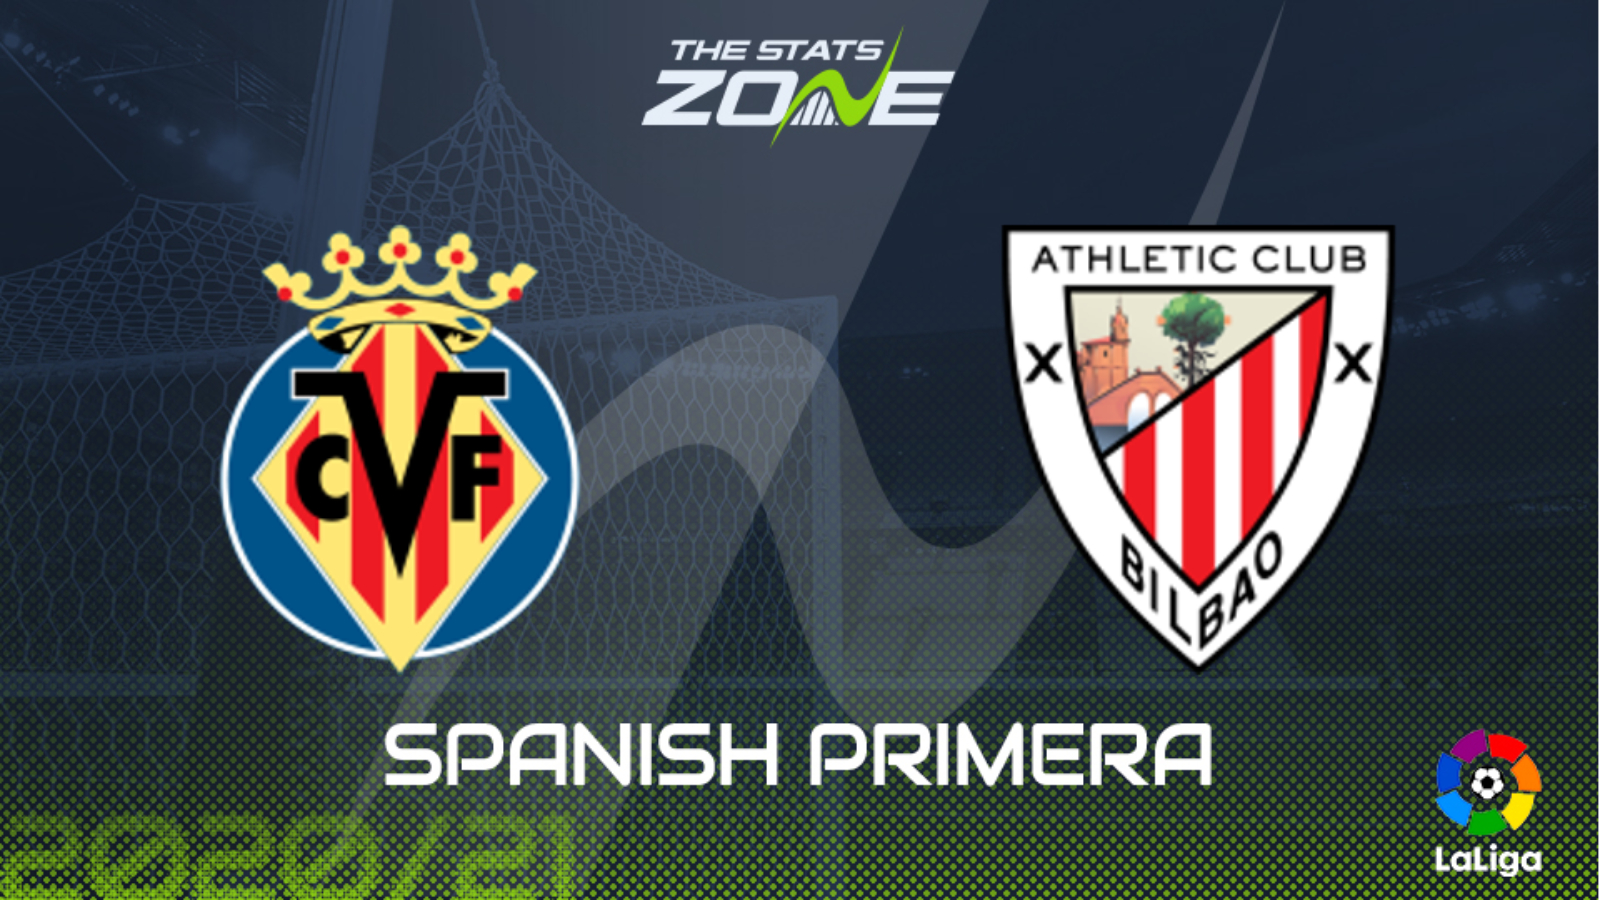 Villarreal vs athletic bilbao betting tips christophe abetting